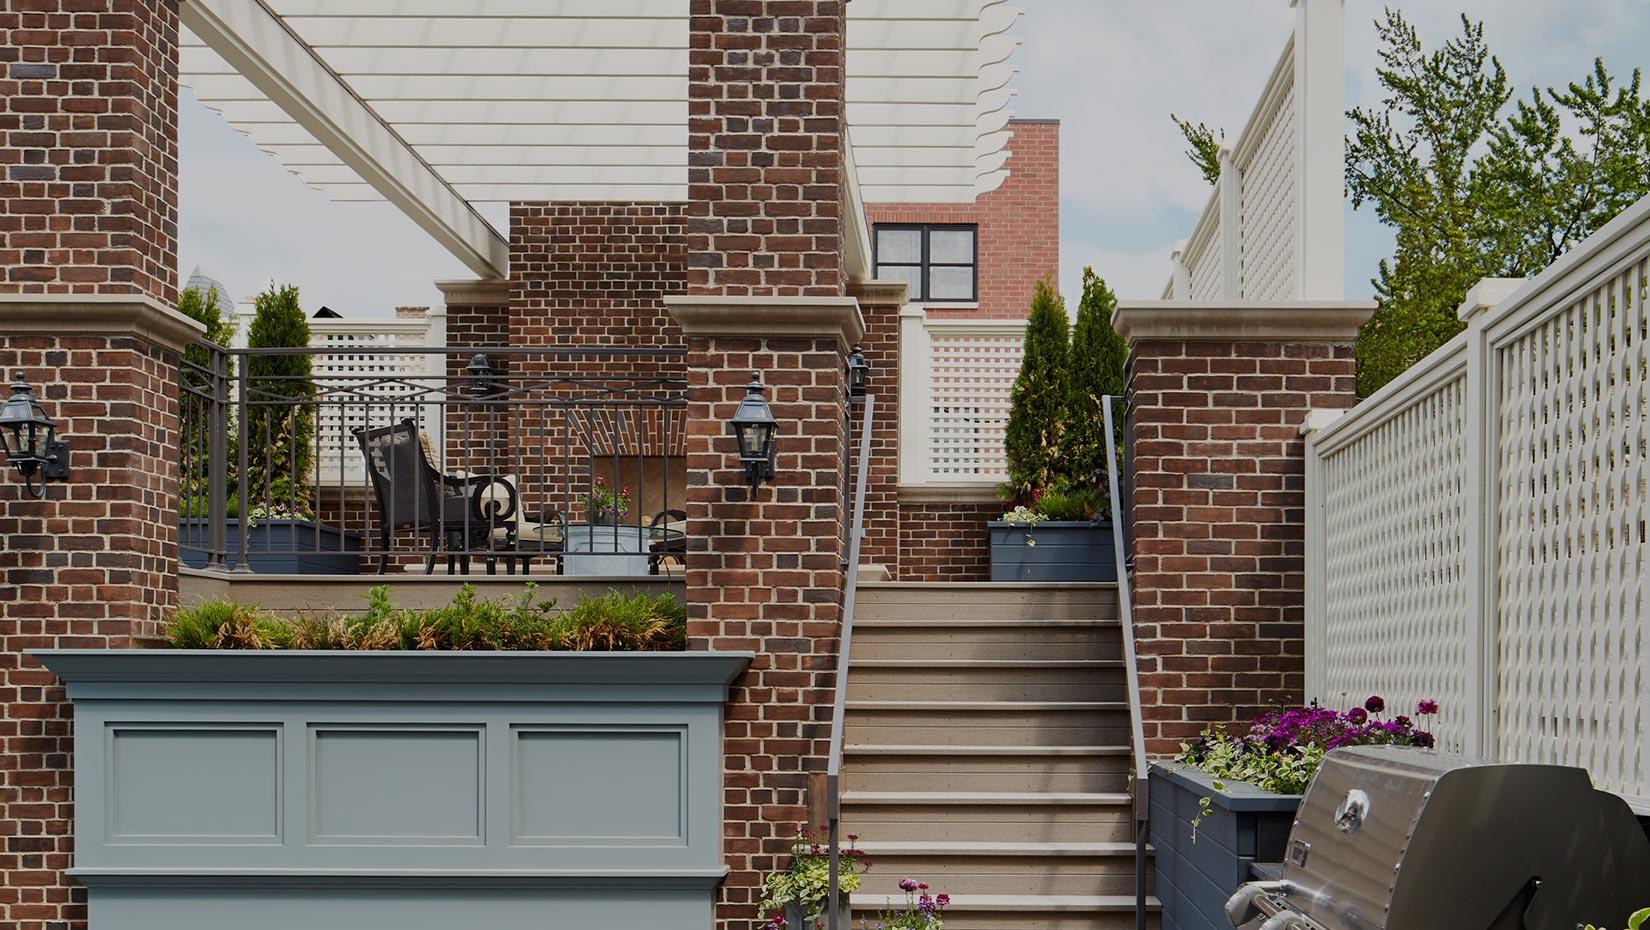 chicago raised brick patio from landscape architect